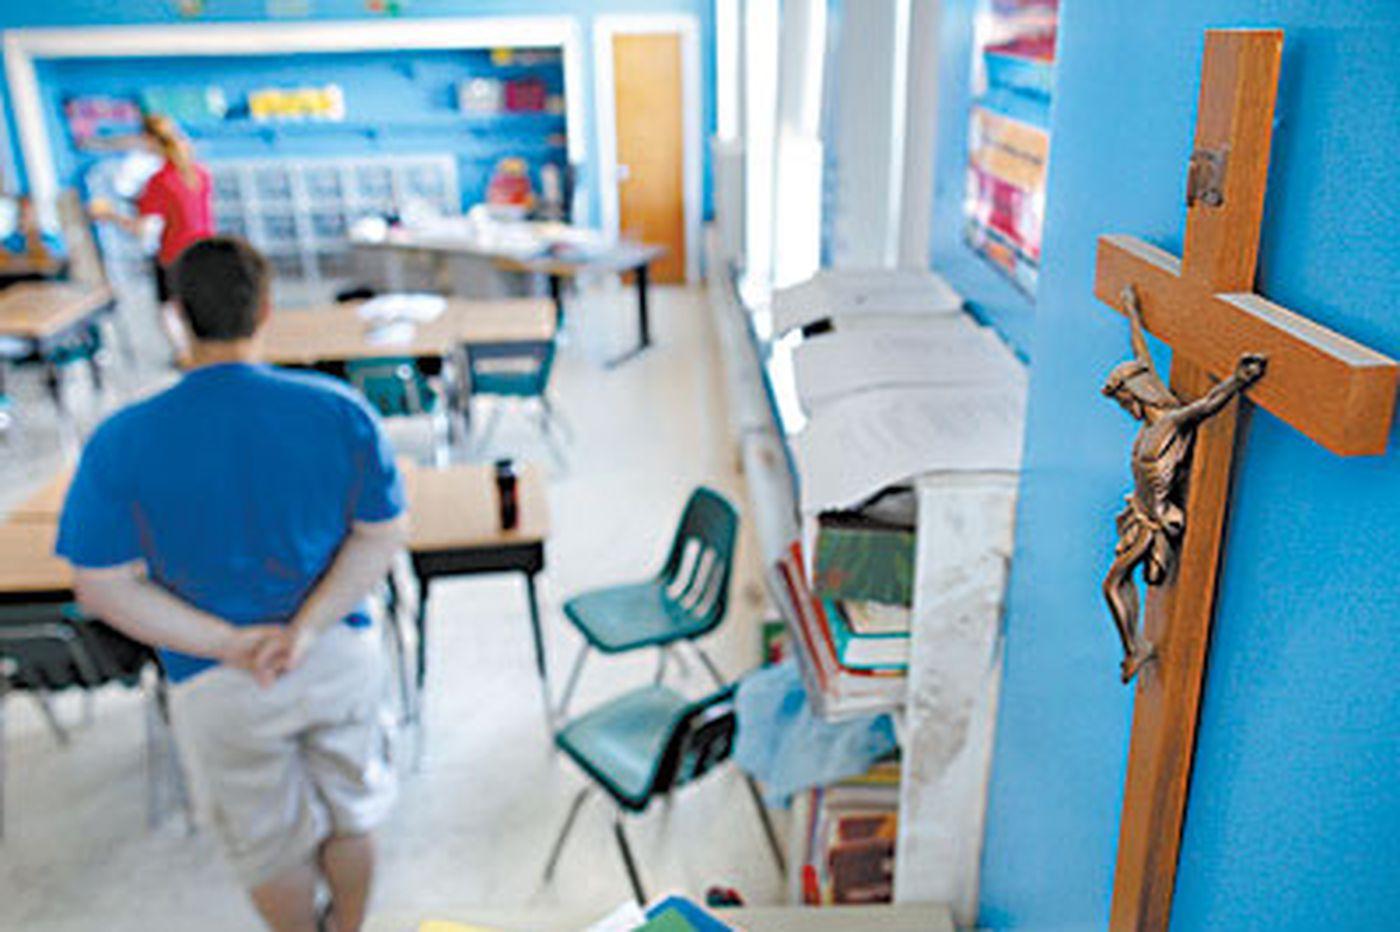 Camden's struggling Catholic schools say no to pending conversion bill